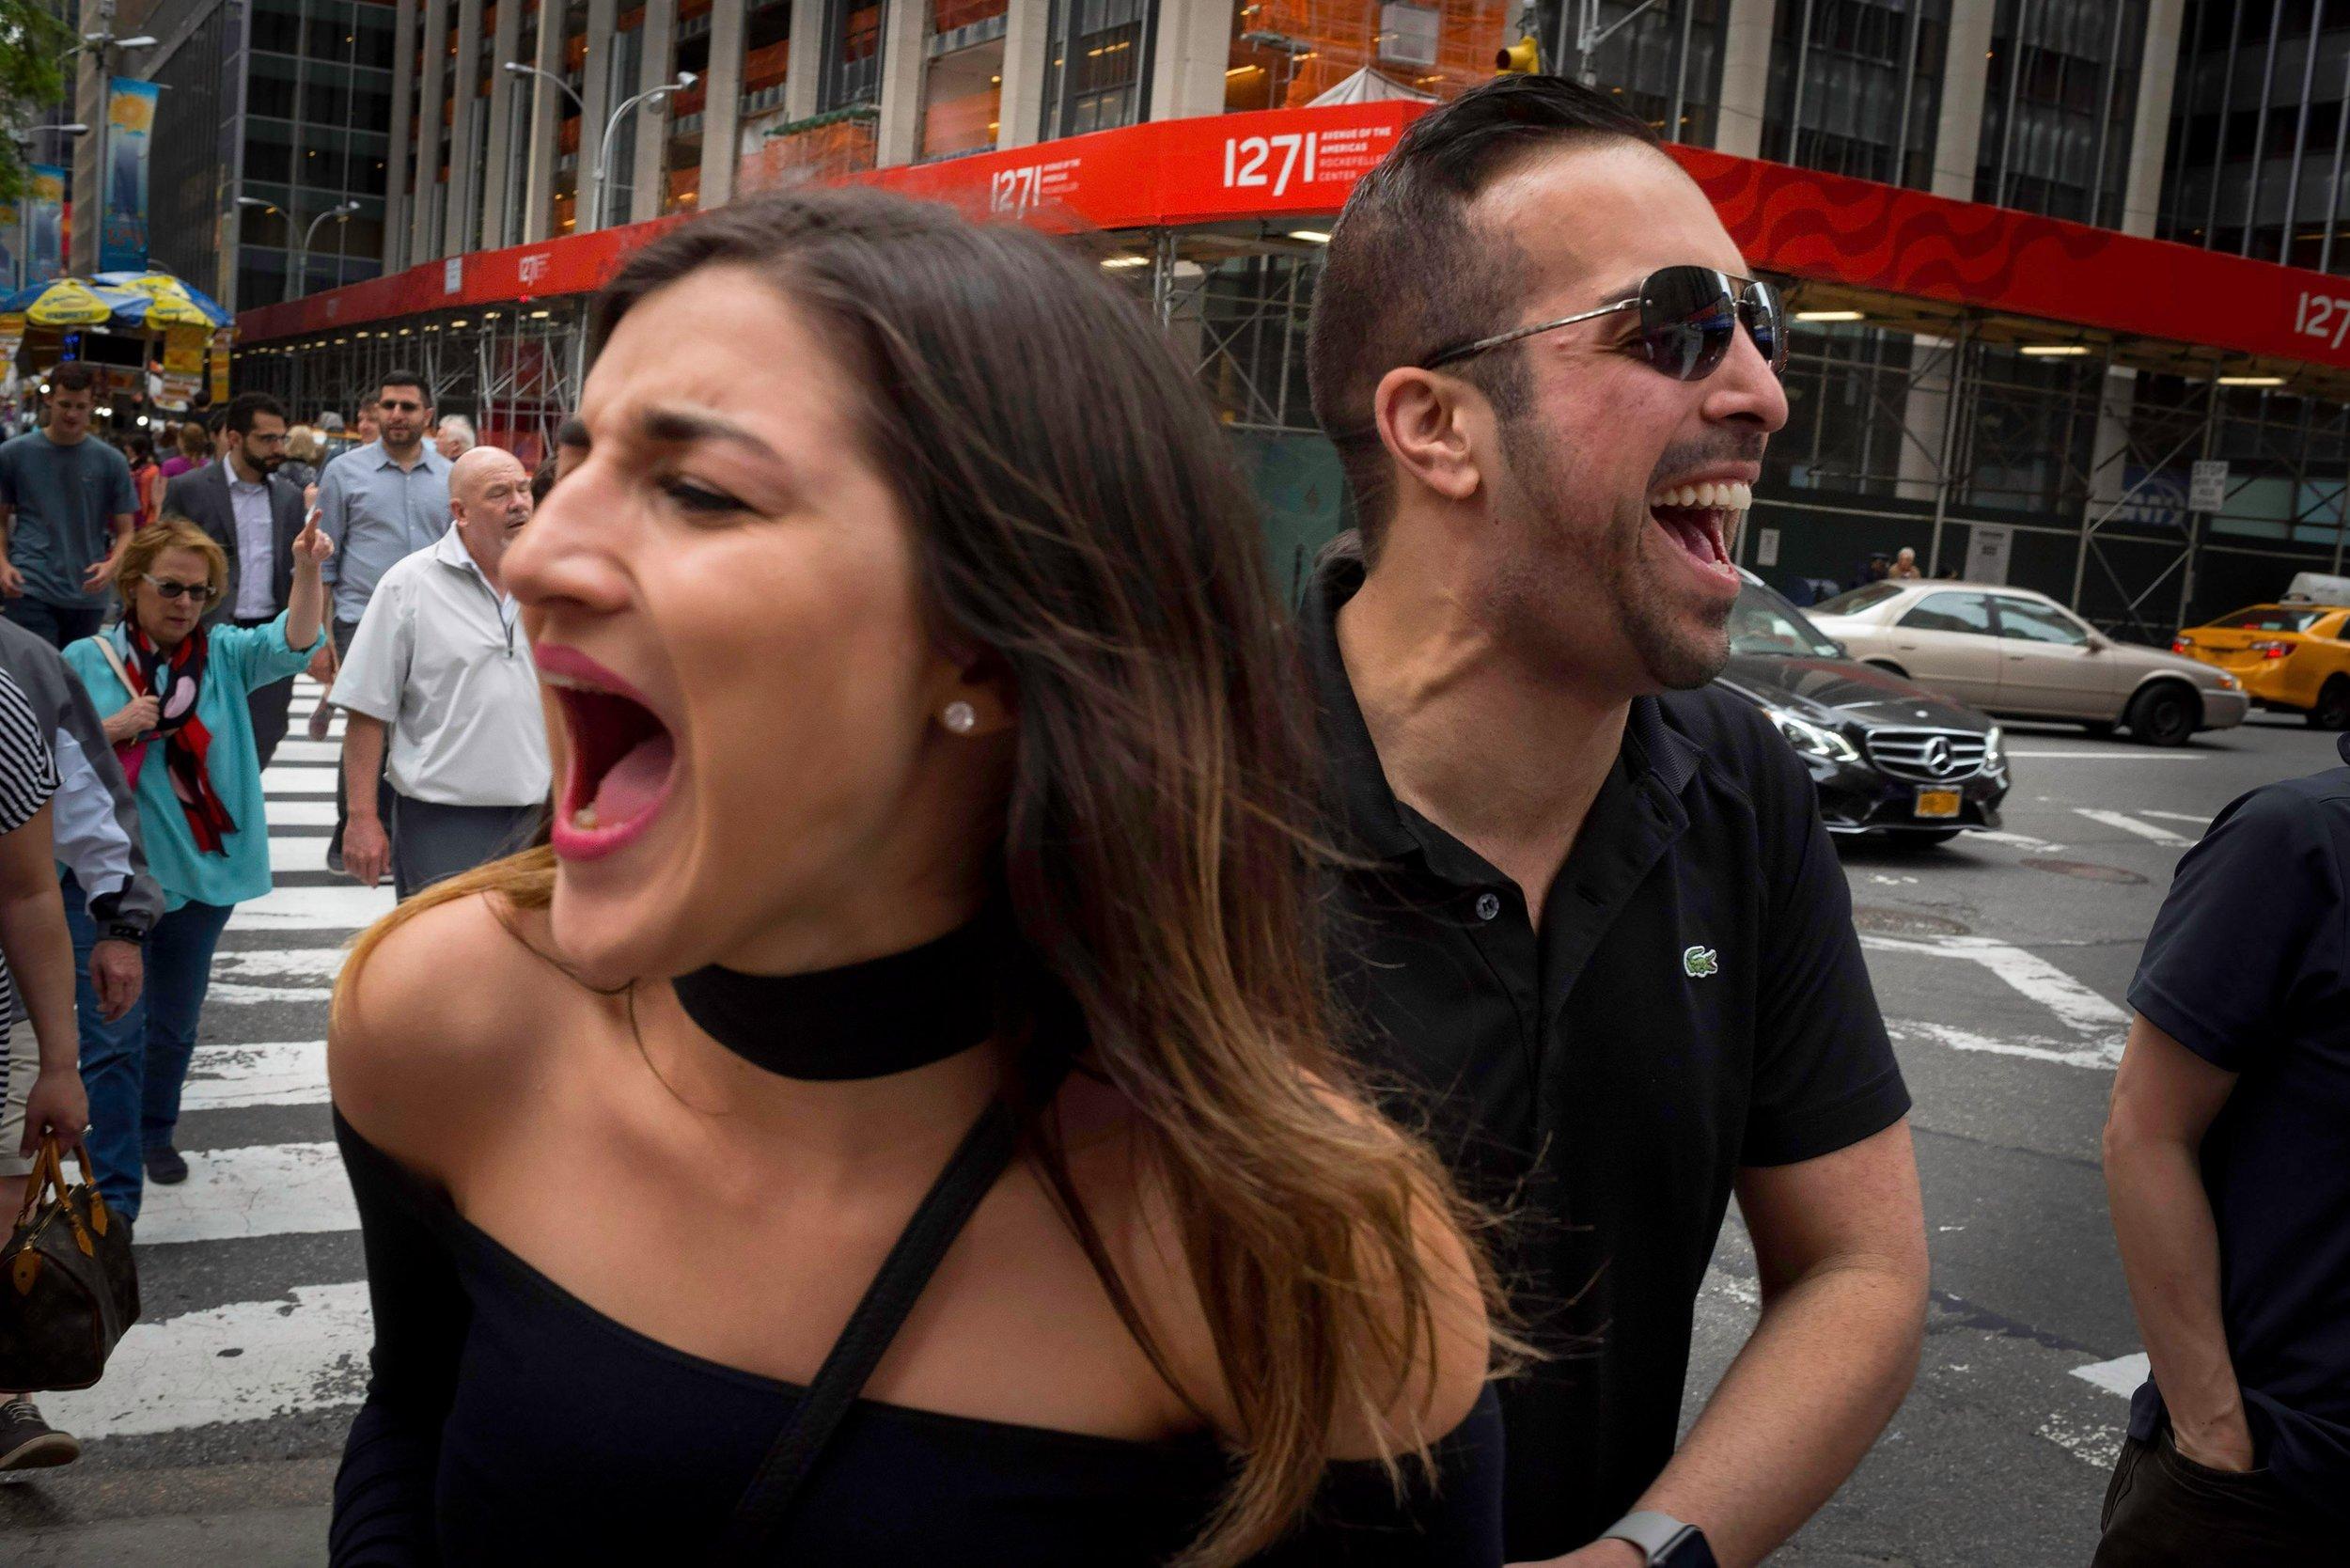 new-york-city-street-photography-collective-frank-multari-1